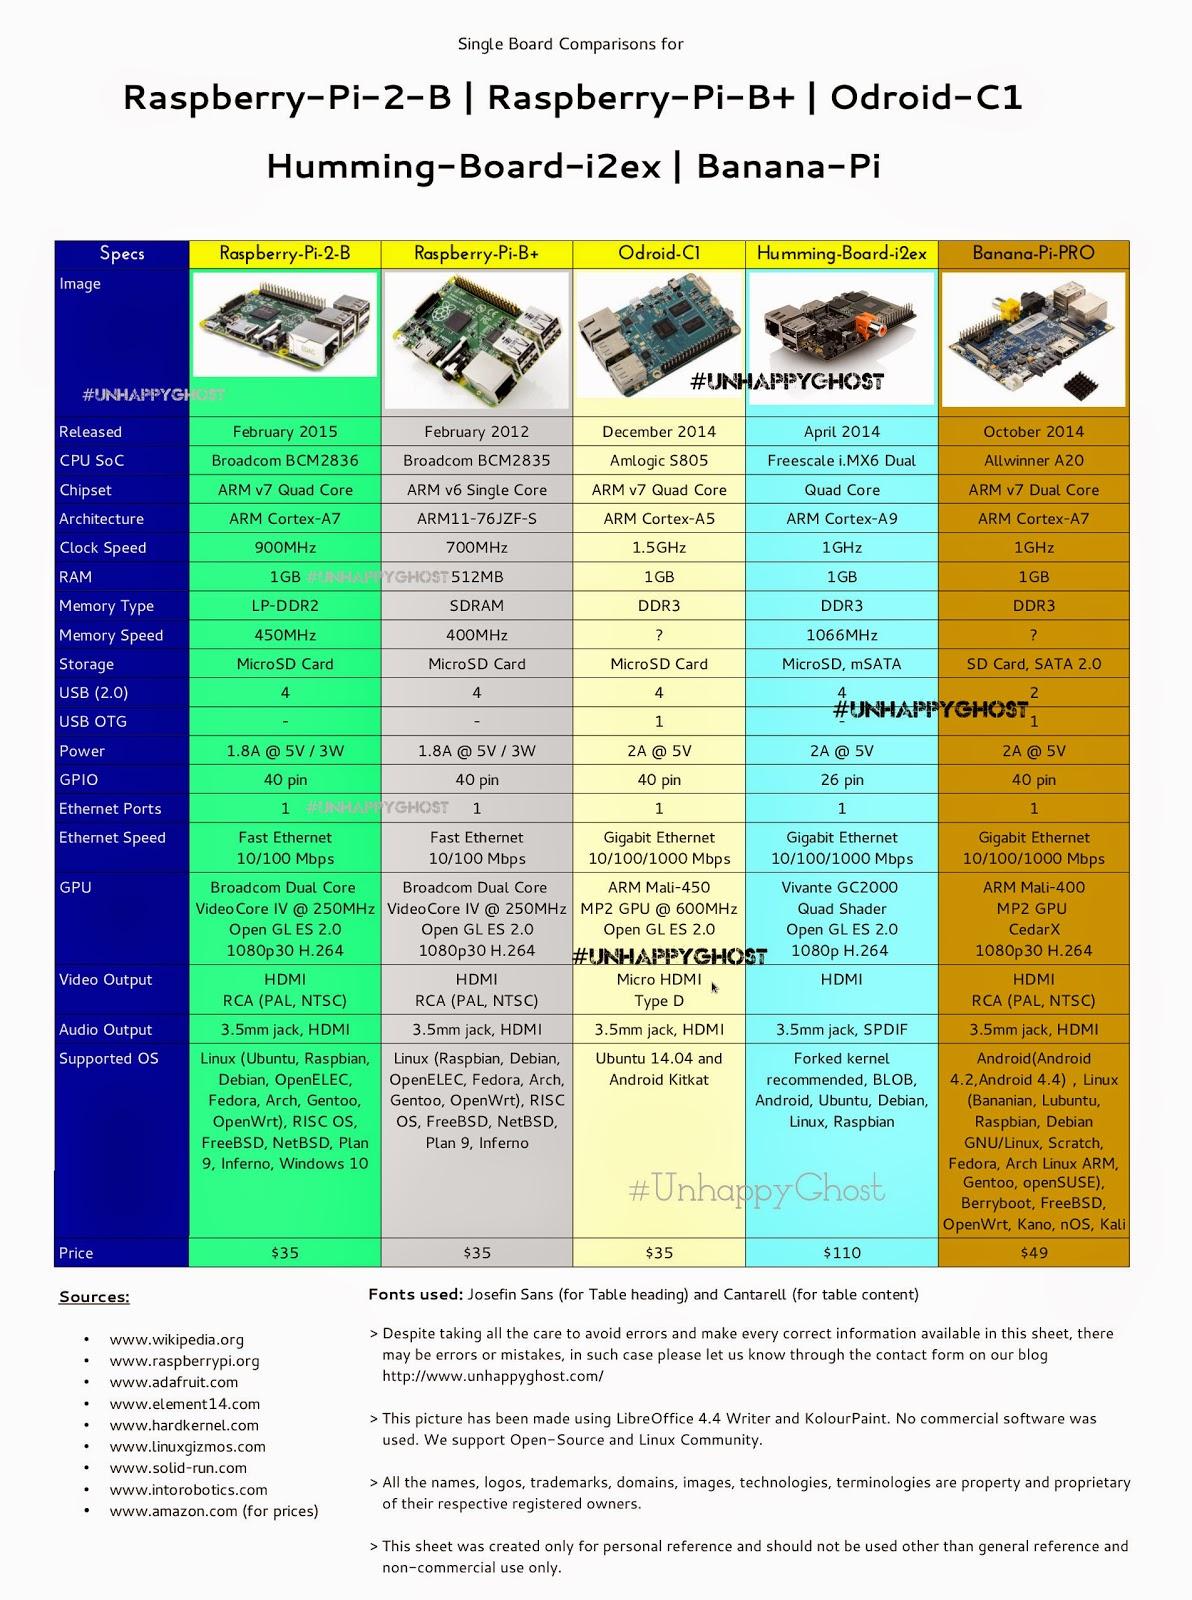 raspberry-pi-2_odroid-c1_banana-pi-pro_humming-board-i2ex